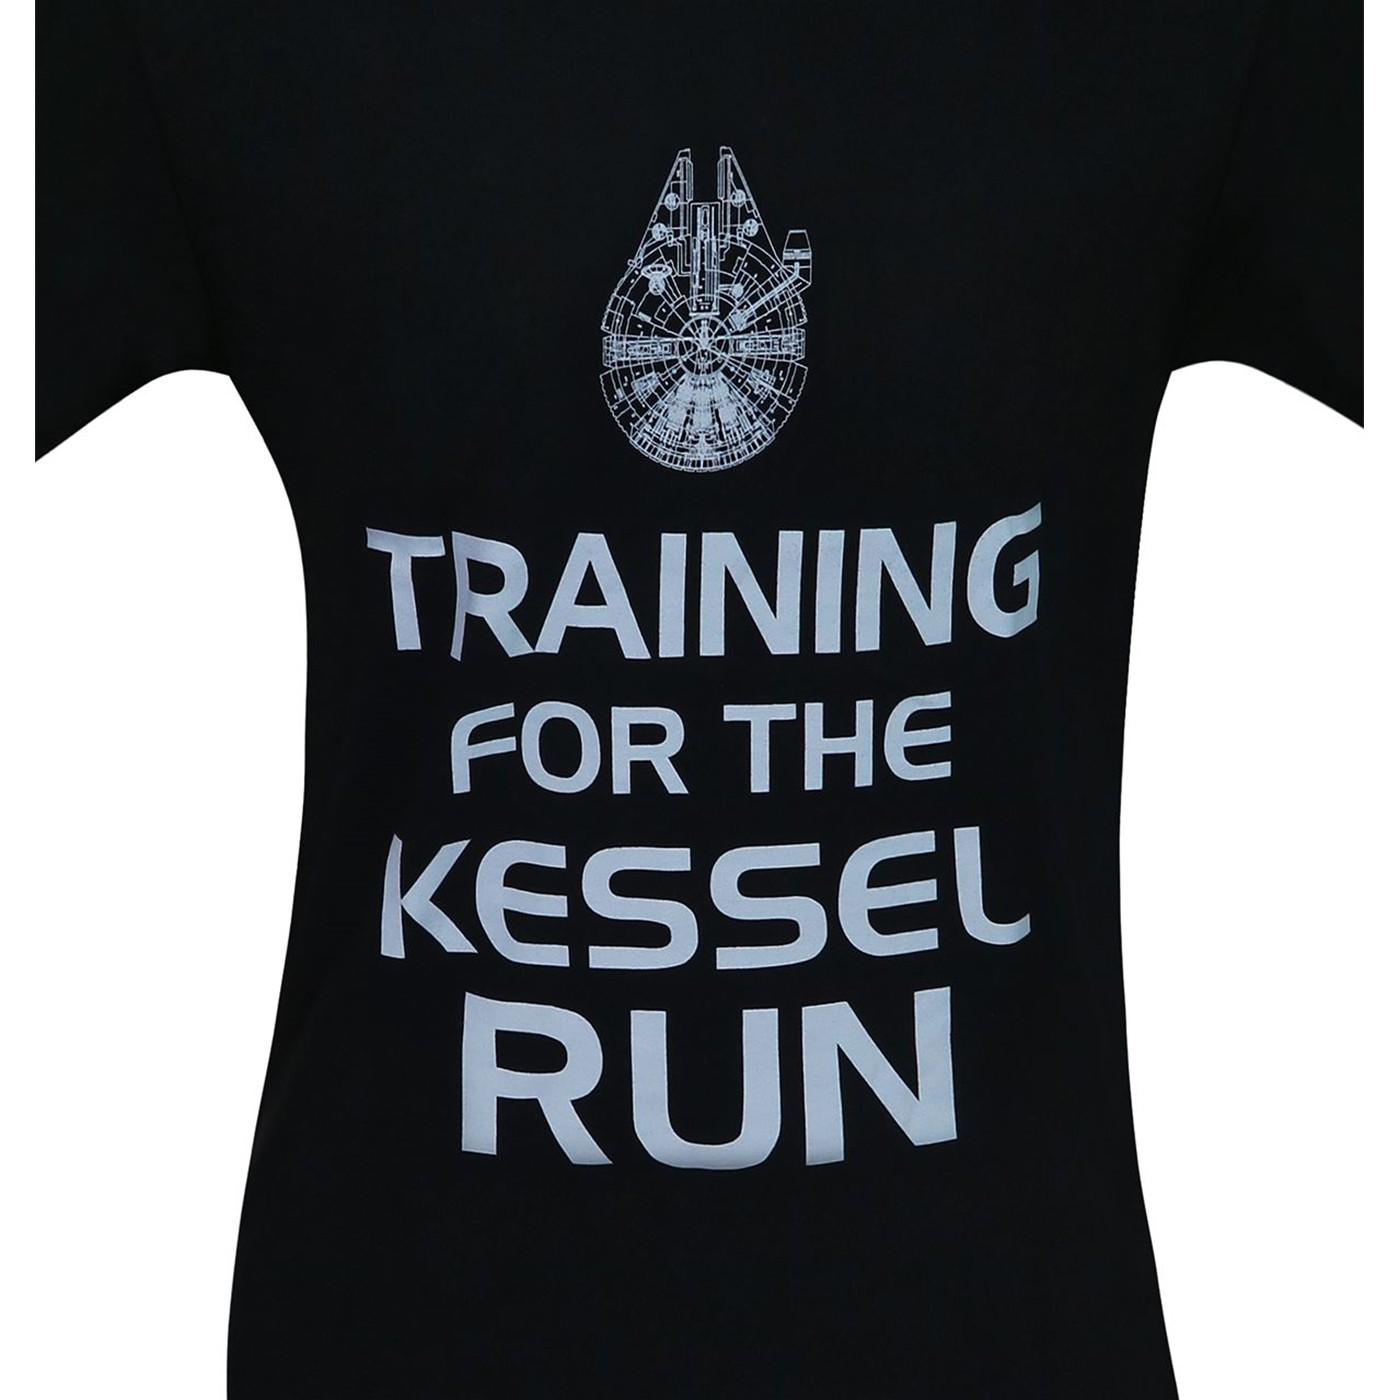 Star Wars Training for the Kessel Run Men's T-Shirt